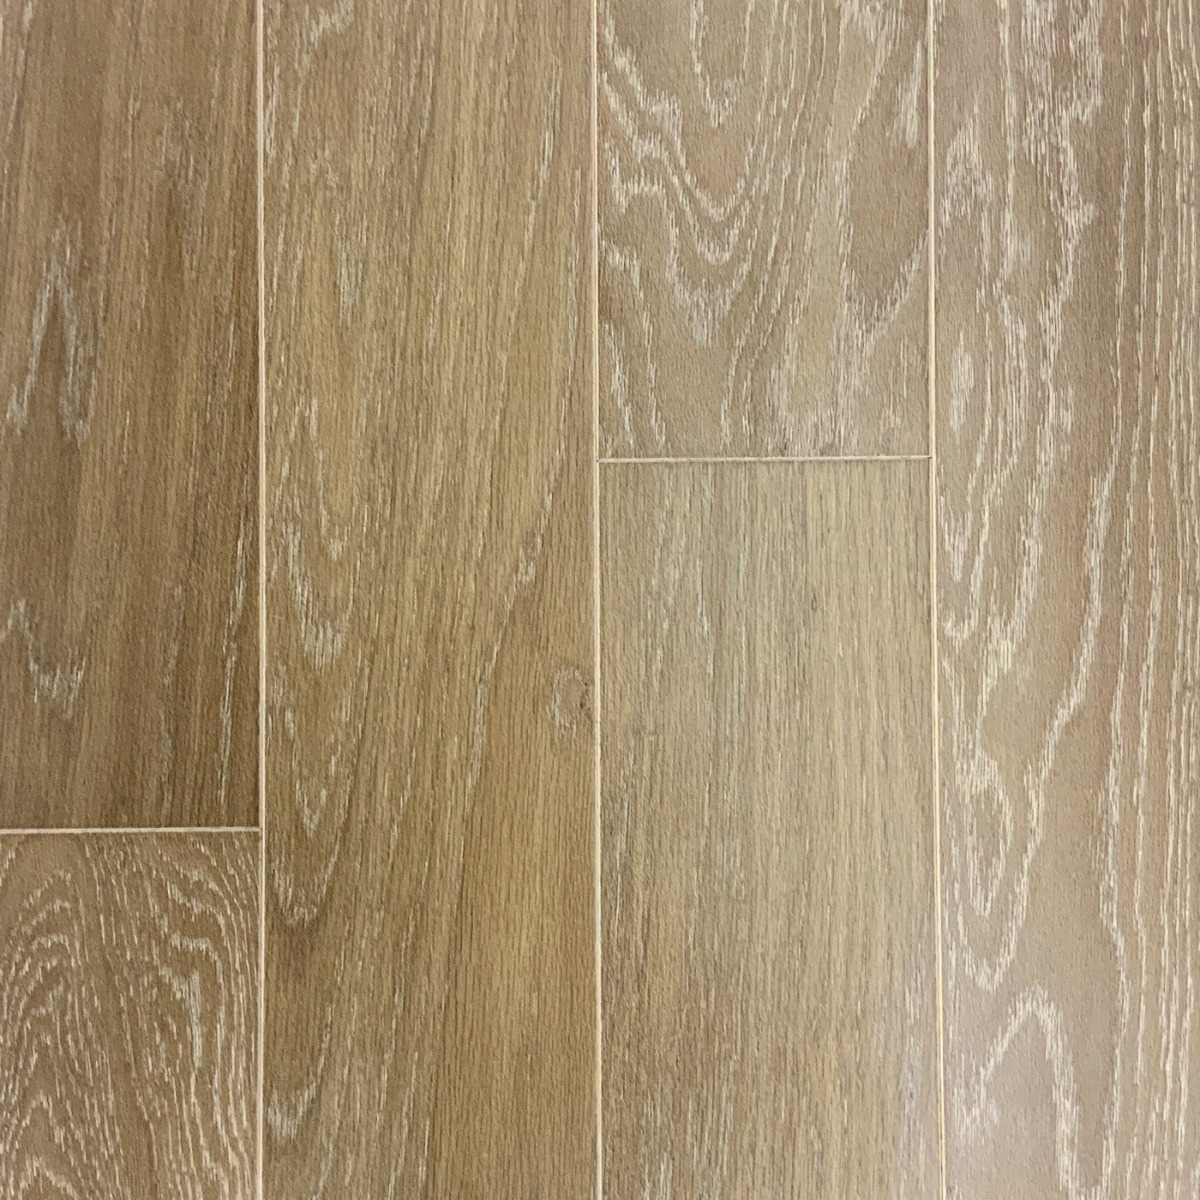 deal l m flooring camden white oak collection engineered hardwood in boardwalk bleach color